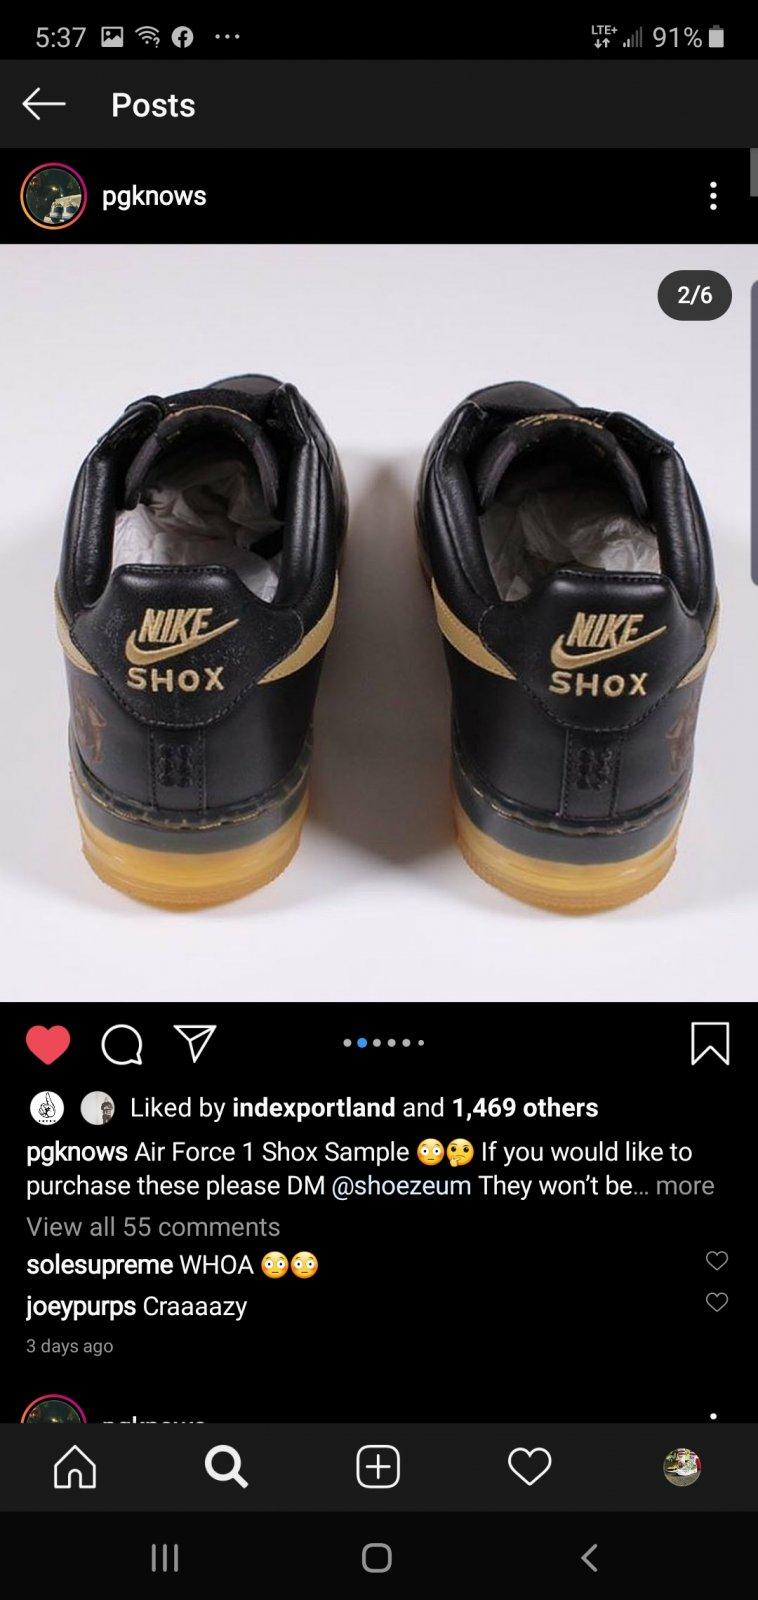 Screenshot_20191204-173725_Instagram.jpg